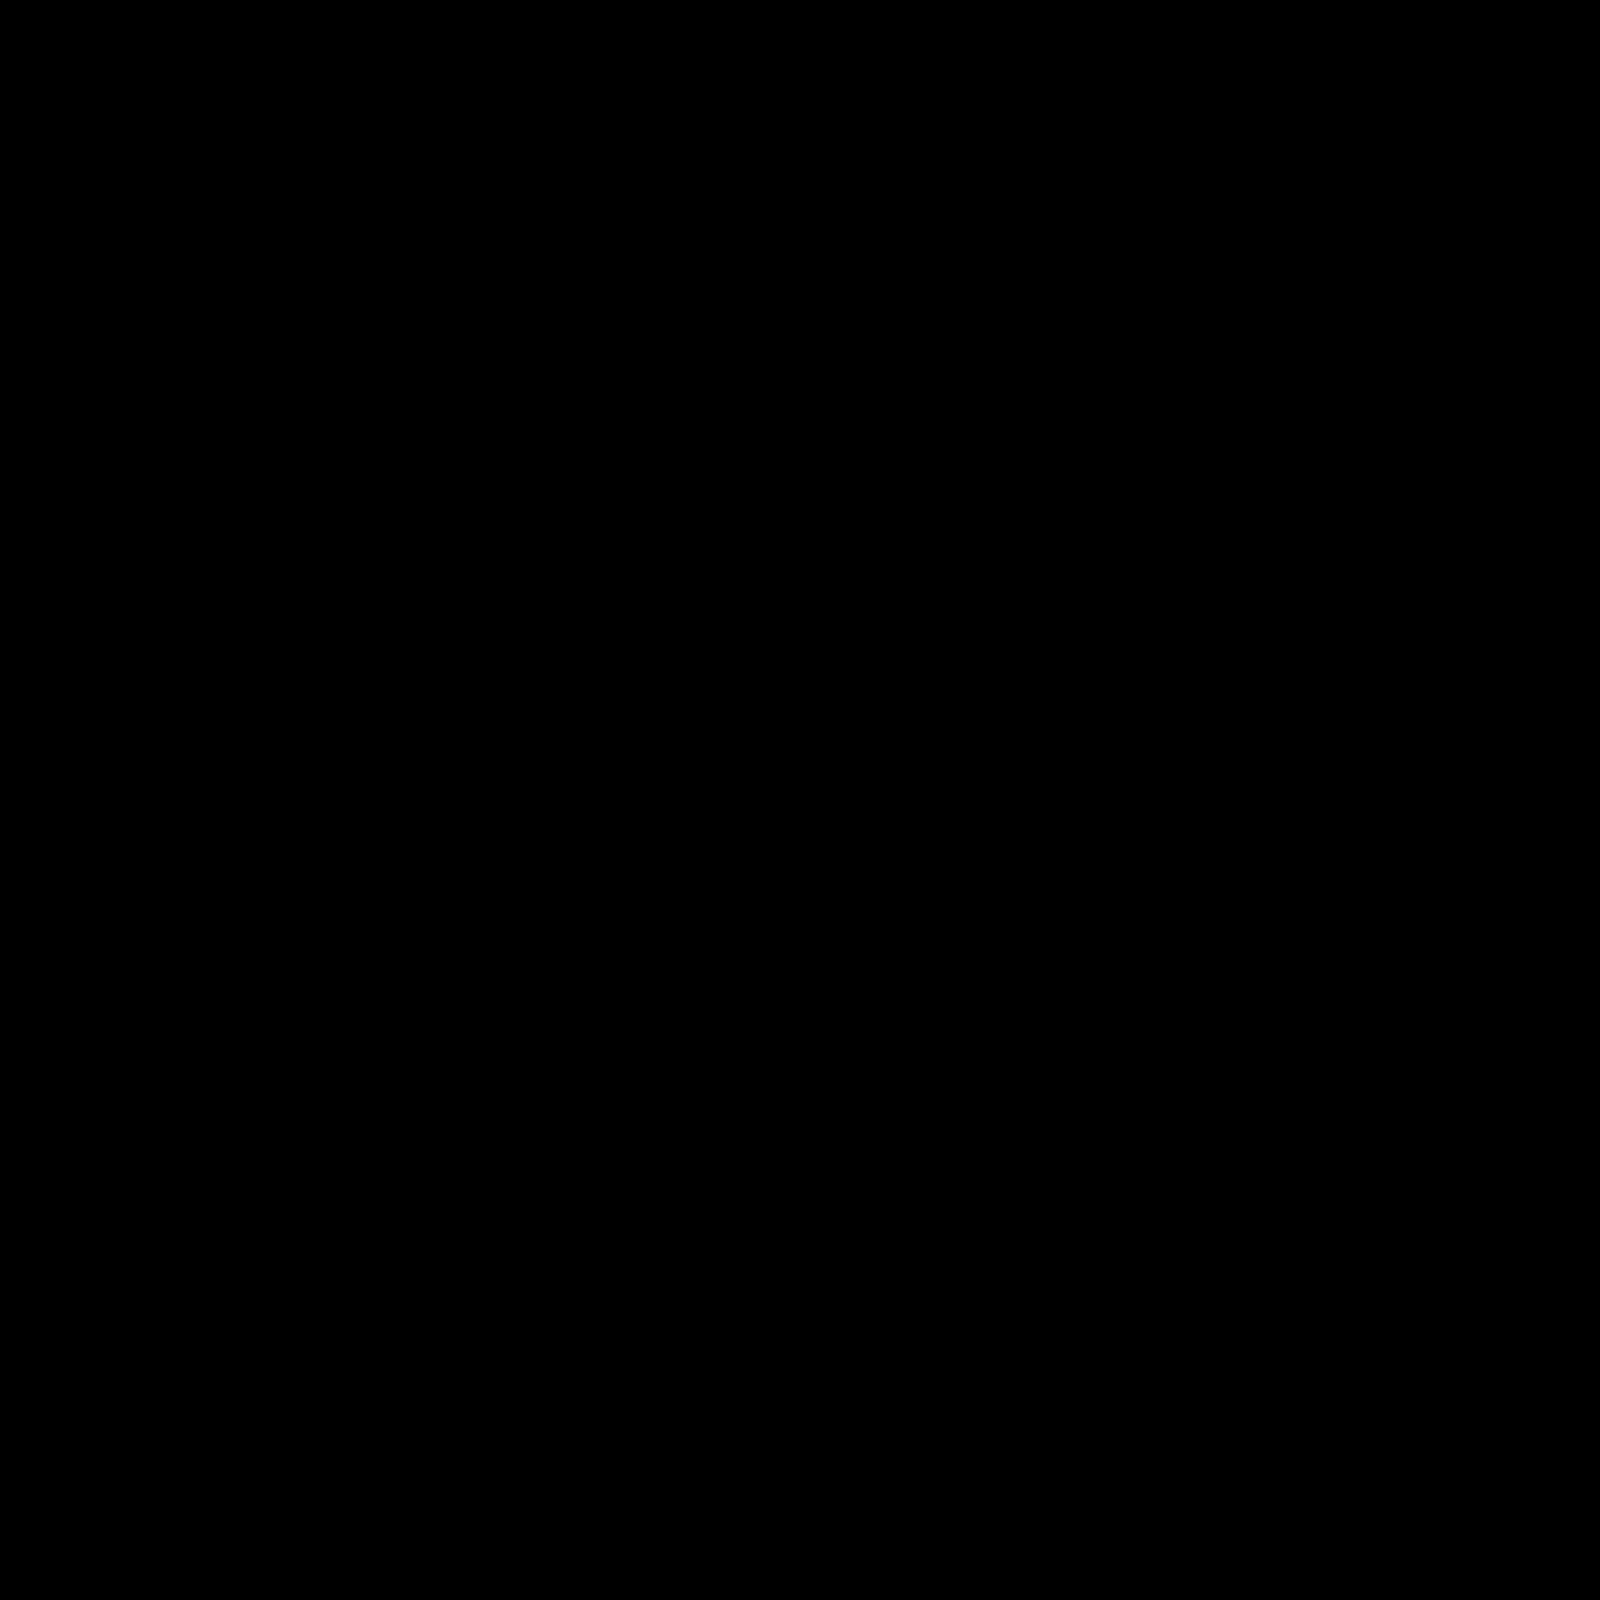 Stack Light icon